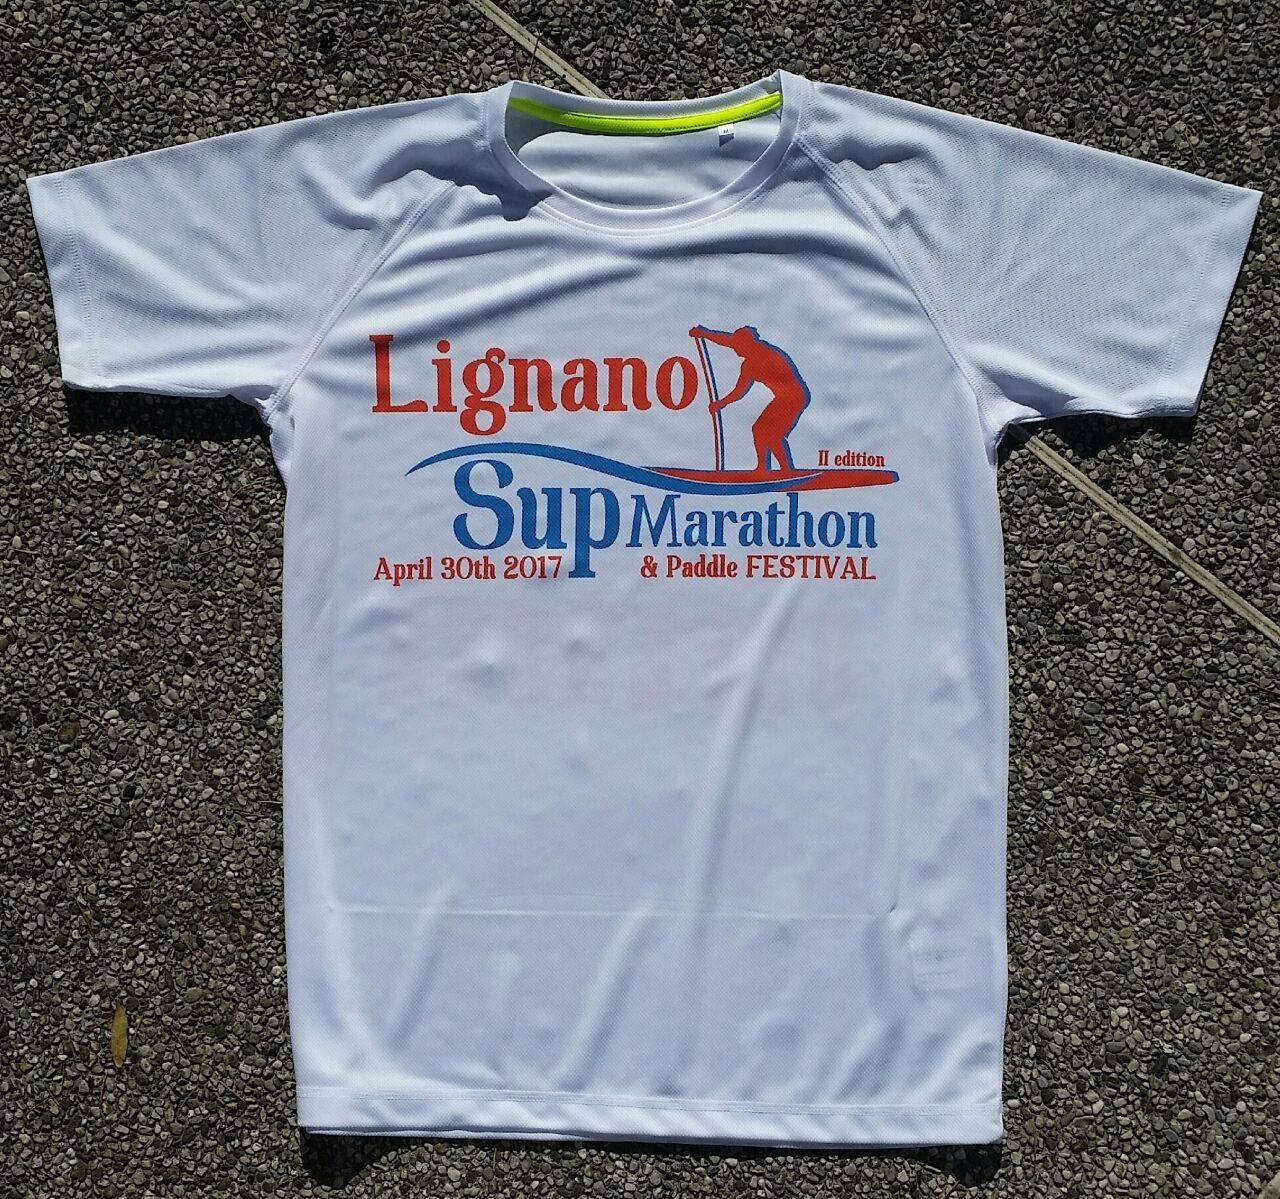 Sup-news-italia-2017-lignano-sup-marathon-02